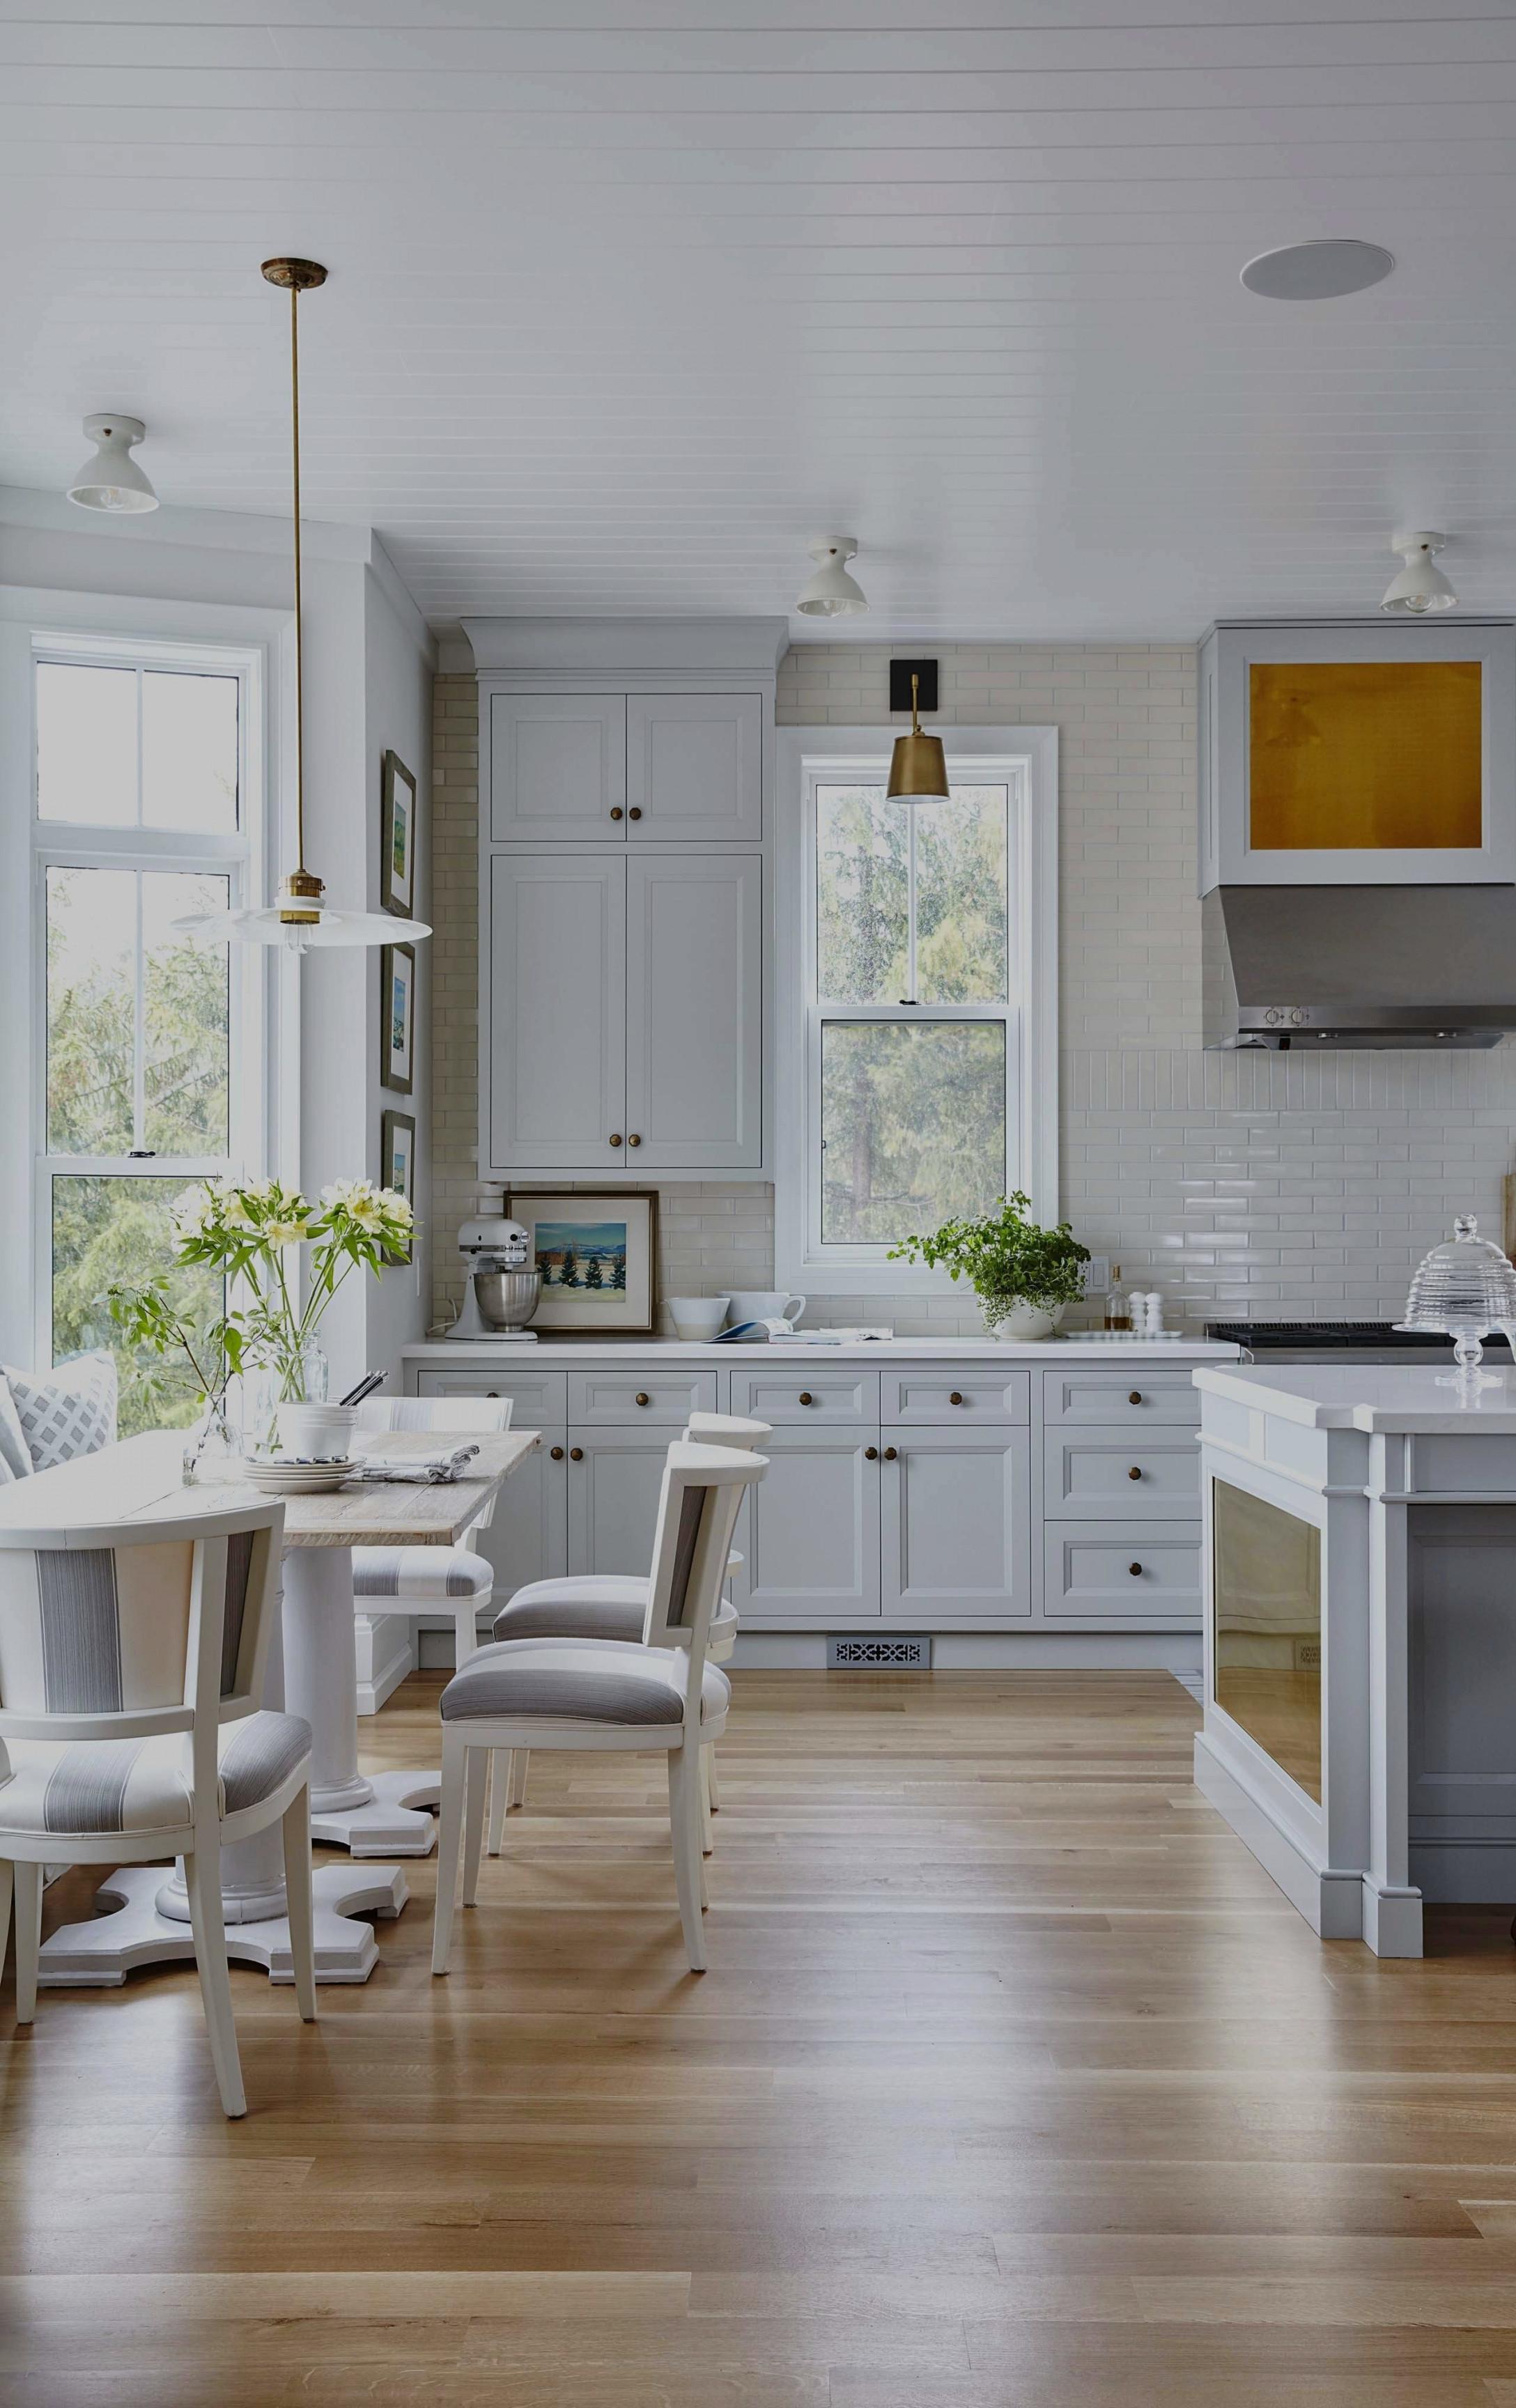 13 Stylish Black Hardwood Floors In Kitchen | Unique ...